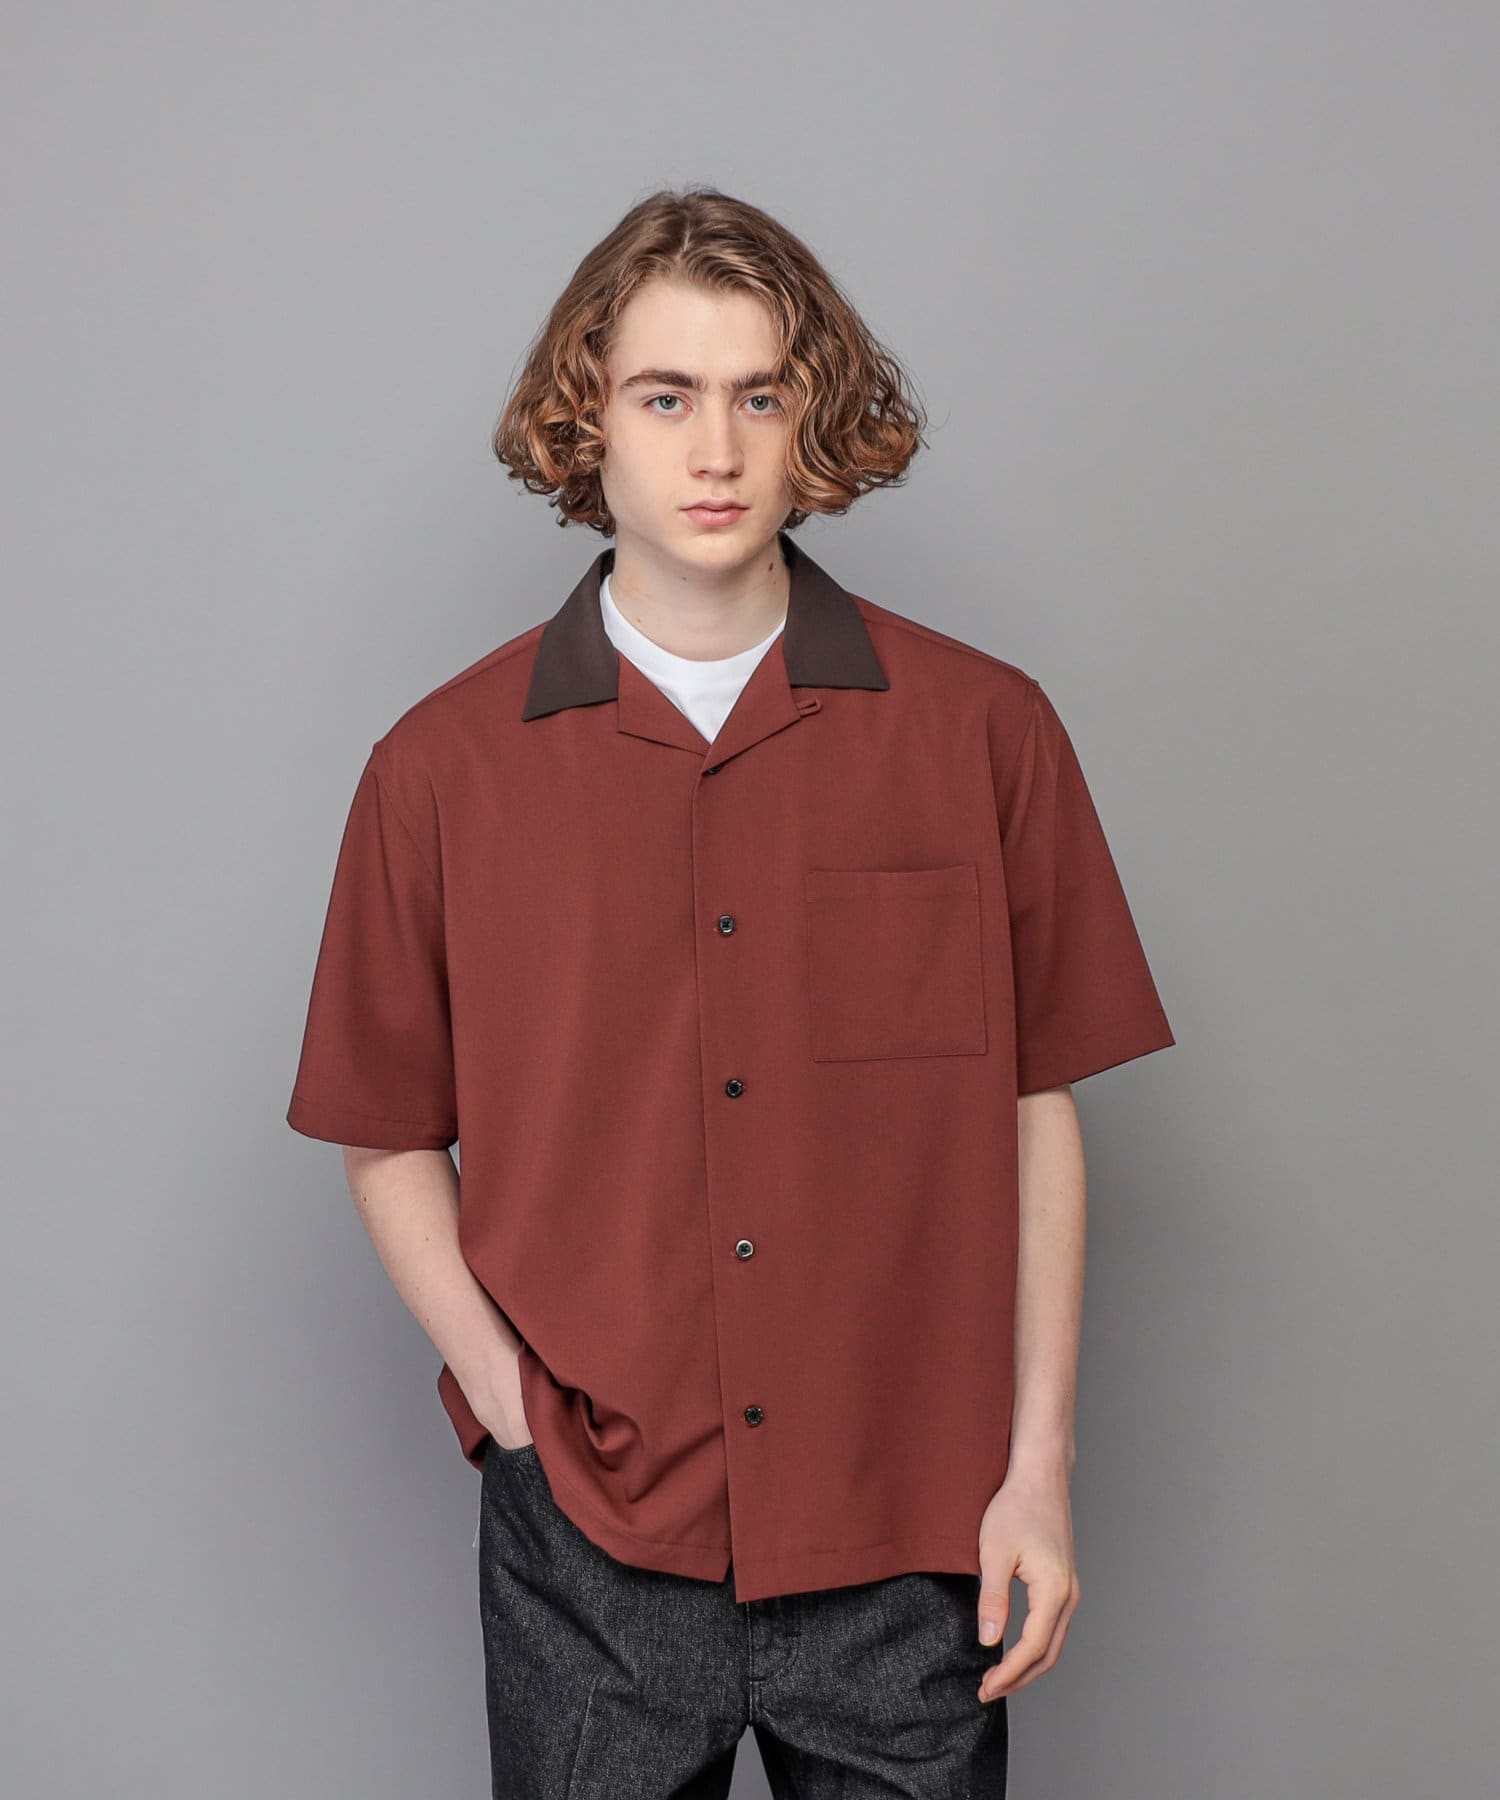 CIAOPANIC(チャオパニック) TRストレッチツイル襟切り替えオープンカラーシャツ